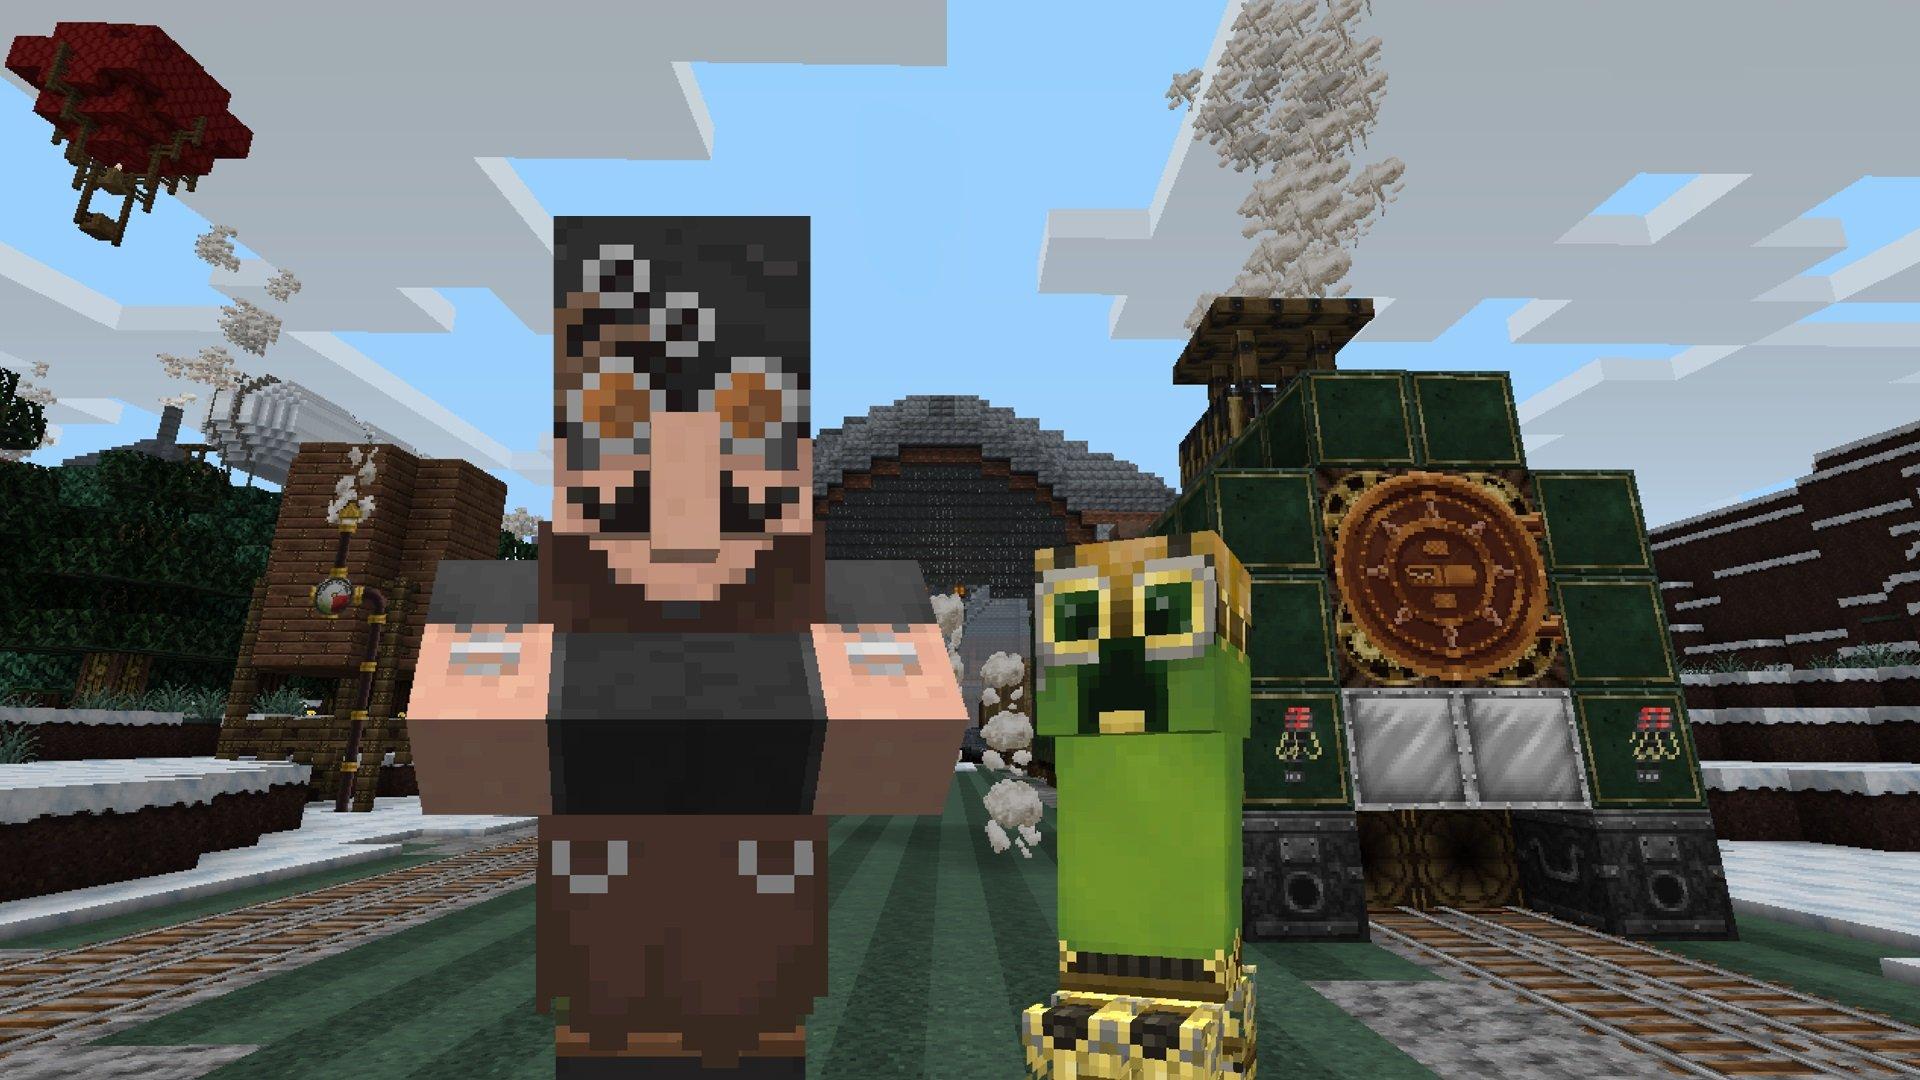 Cool Wallpaper Minecraft Steampunk - 81EWbV3JIuL  Pic_455482.jpg